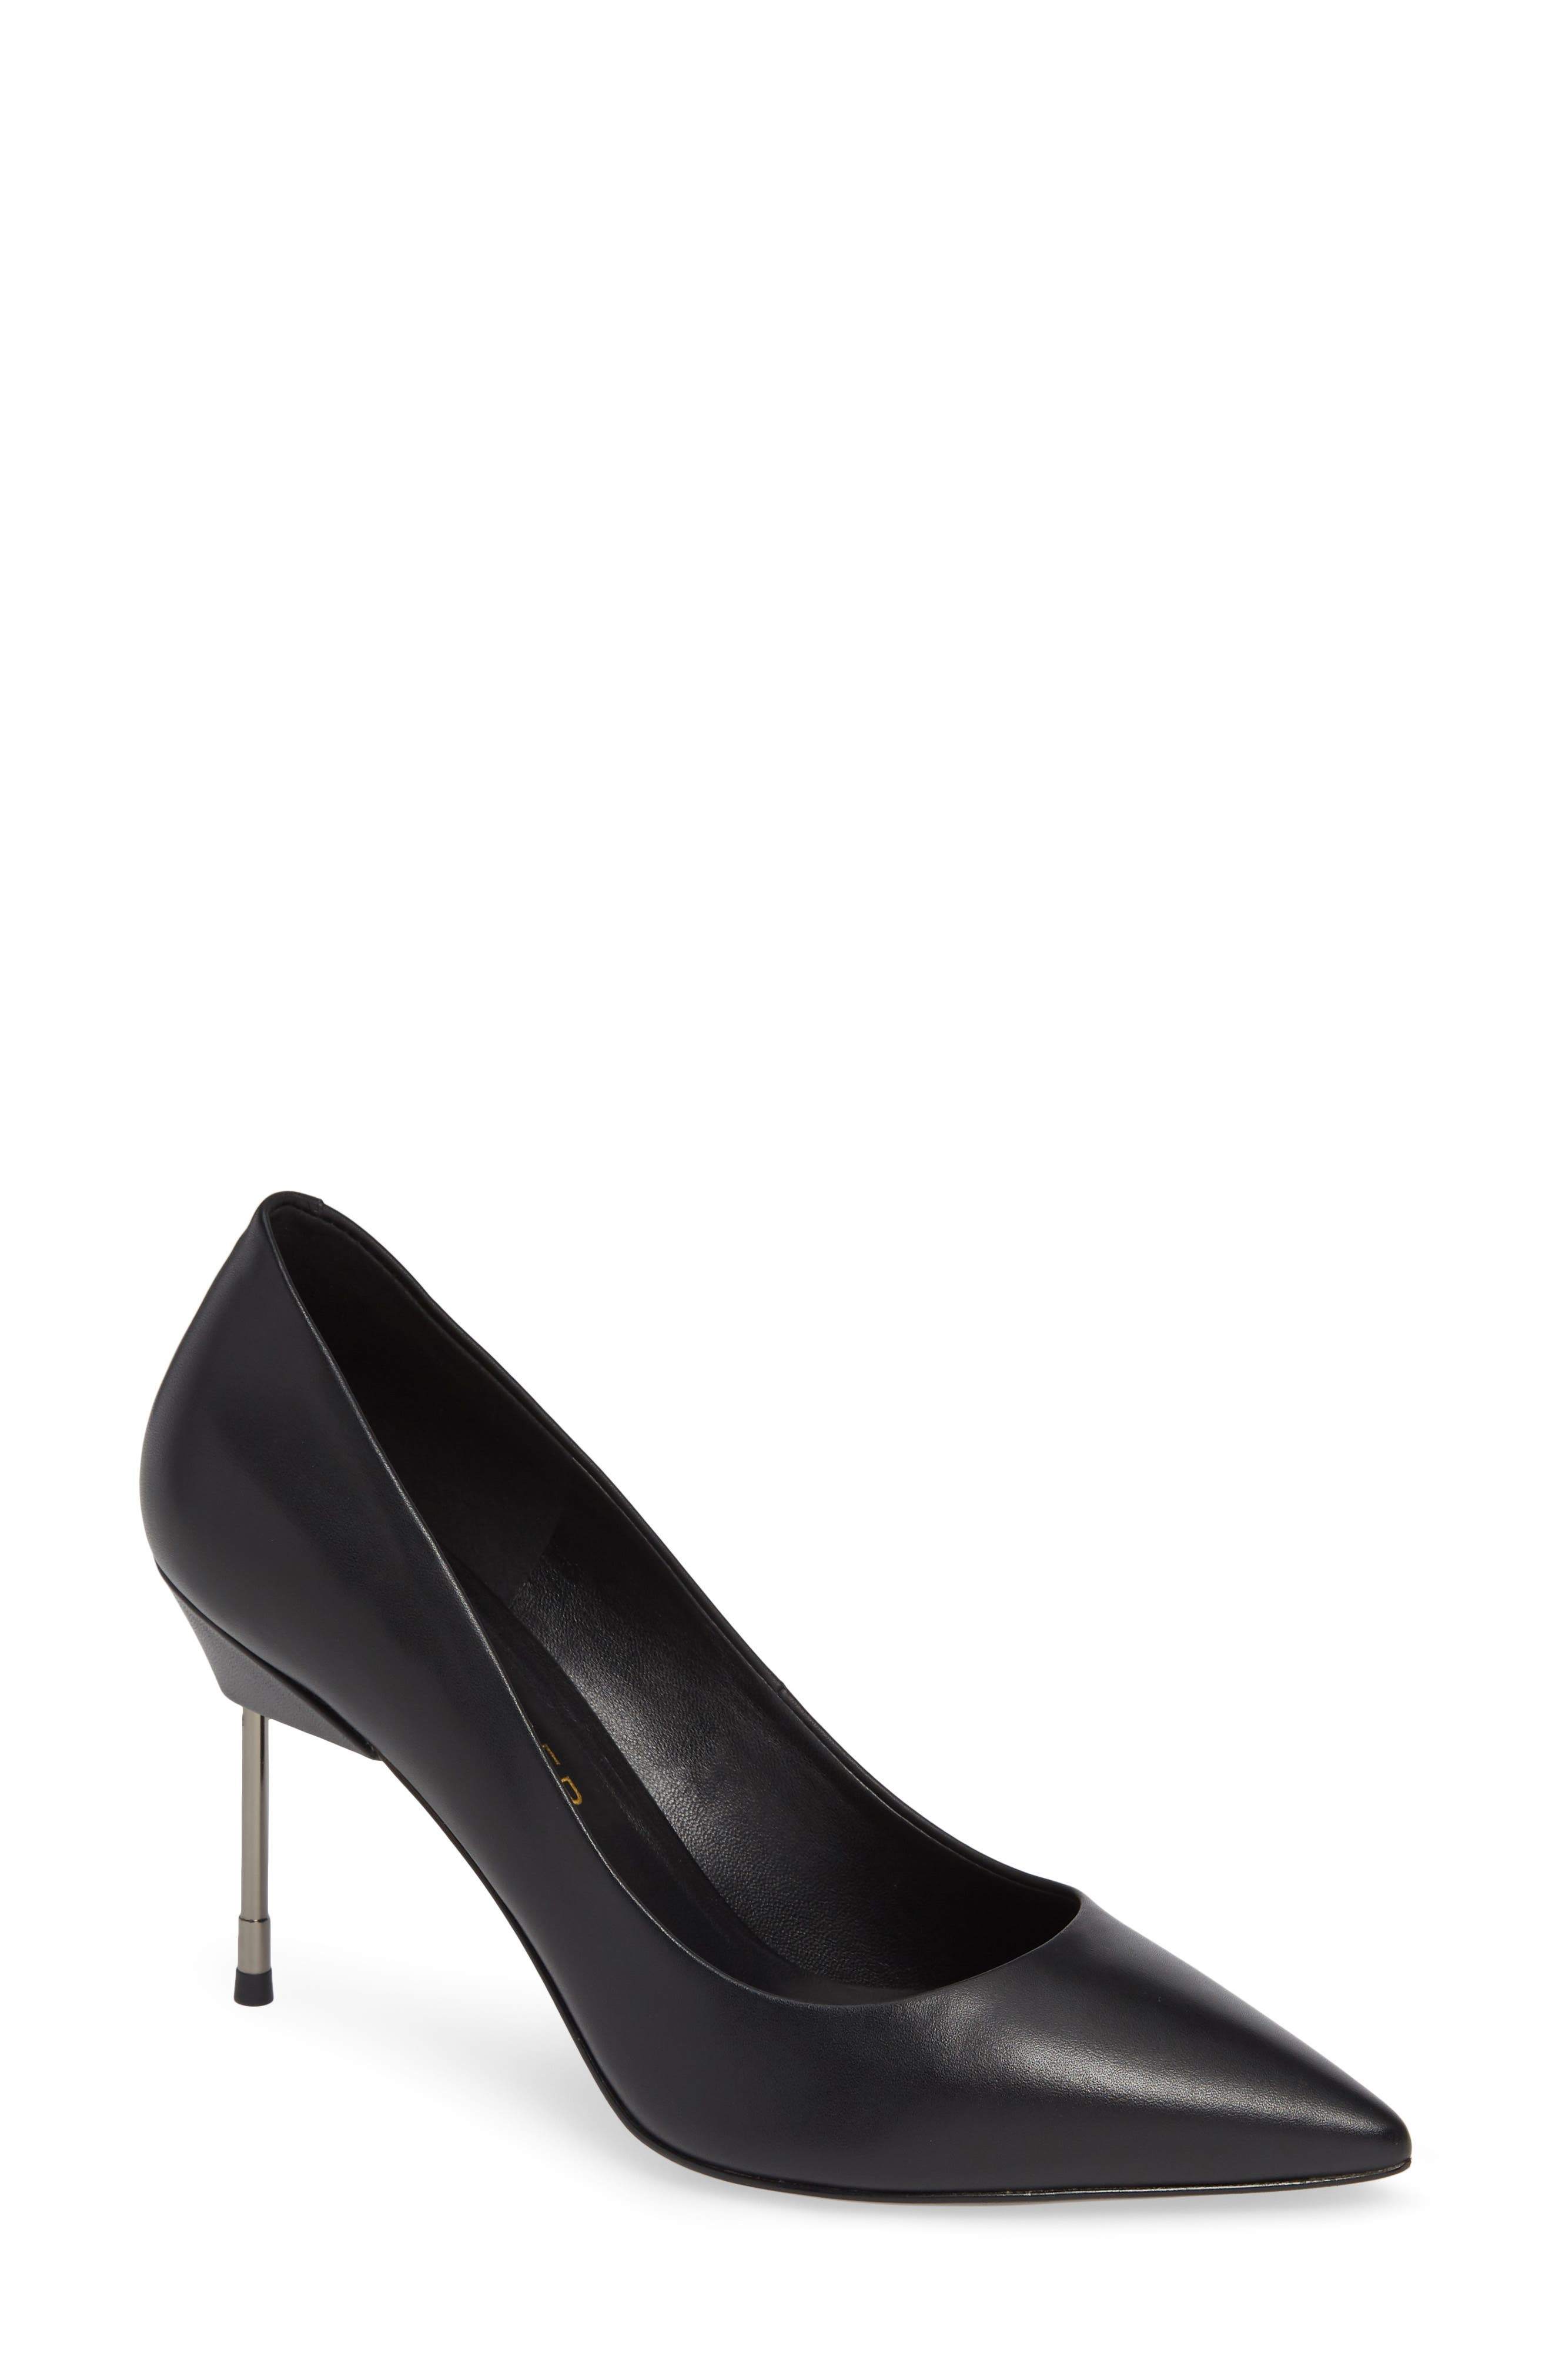 KURT GEIGER Women'S Britton 90 Pointed-Toe Pumps in Black Leather